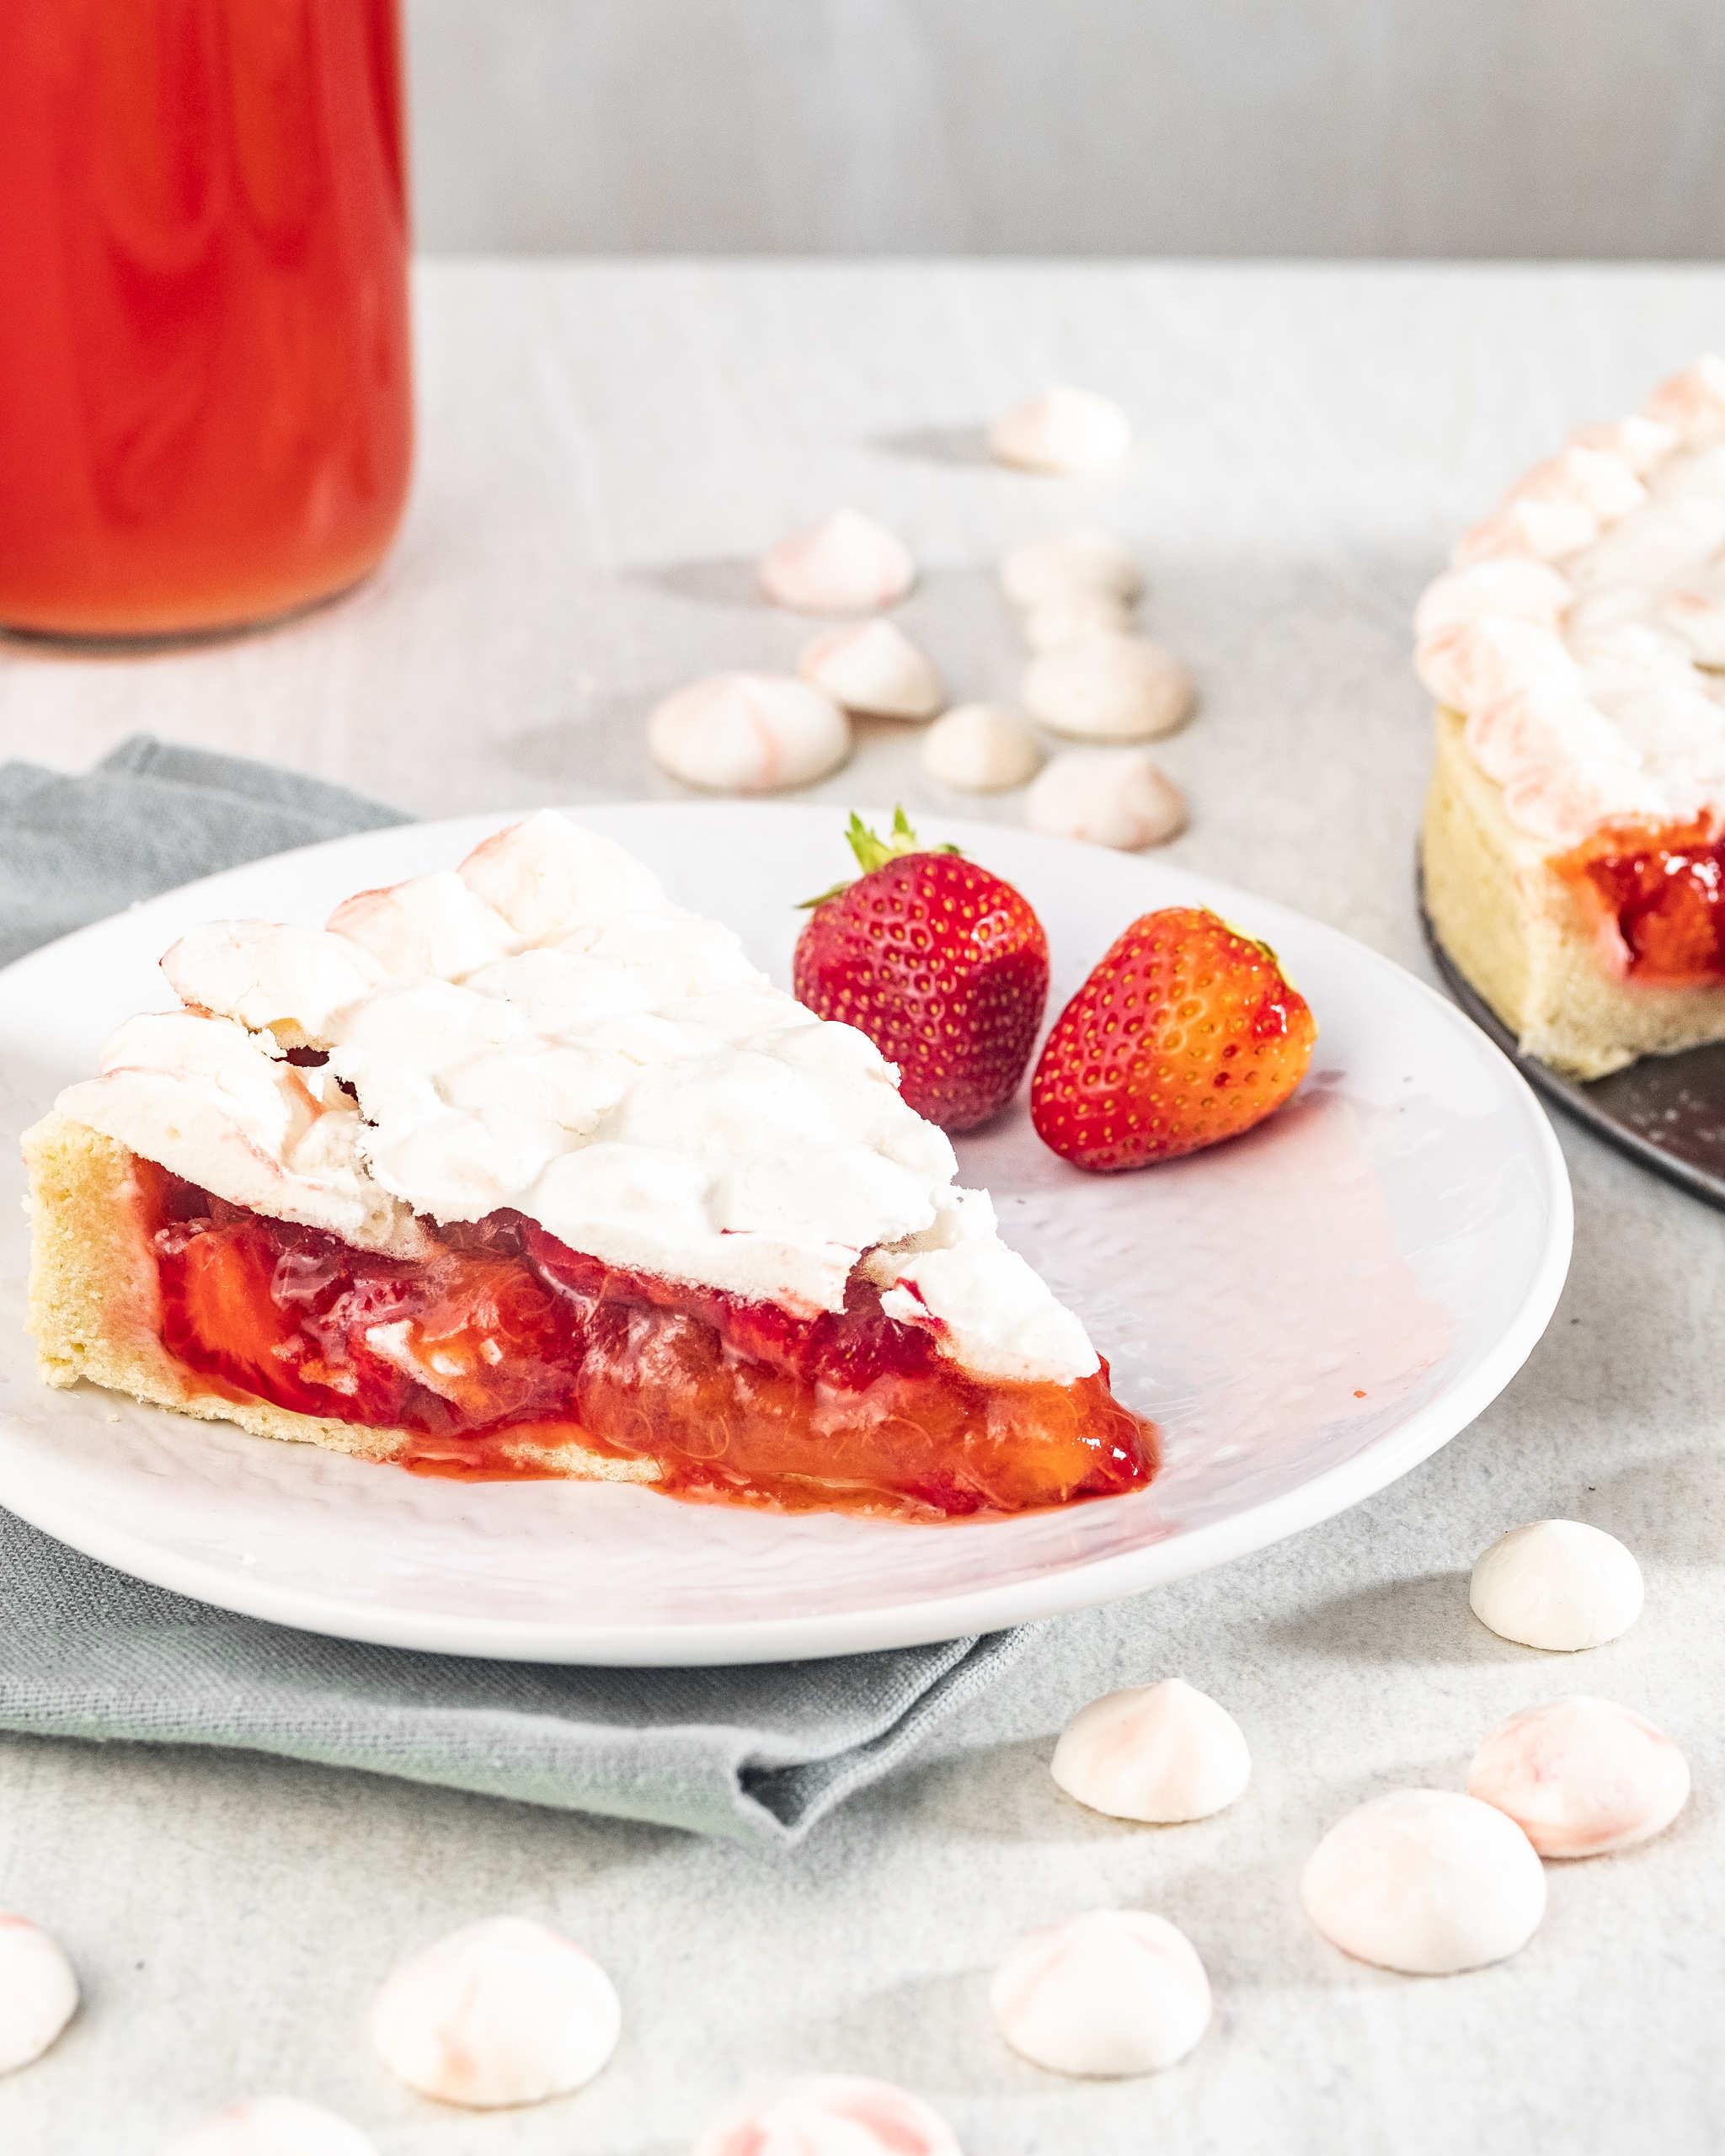 Vegan rhubarb pie with meringue cover